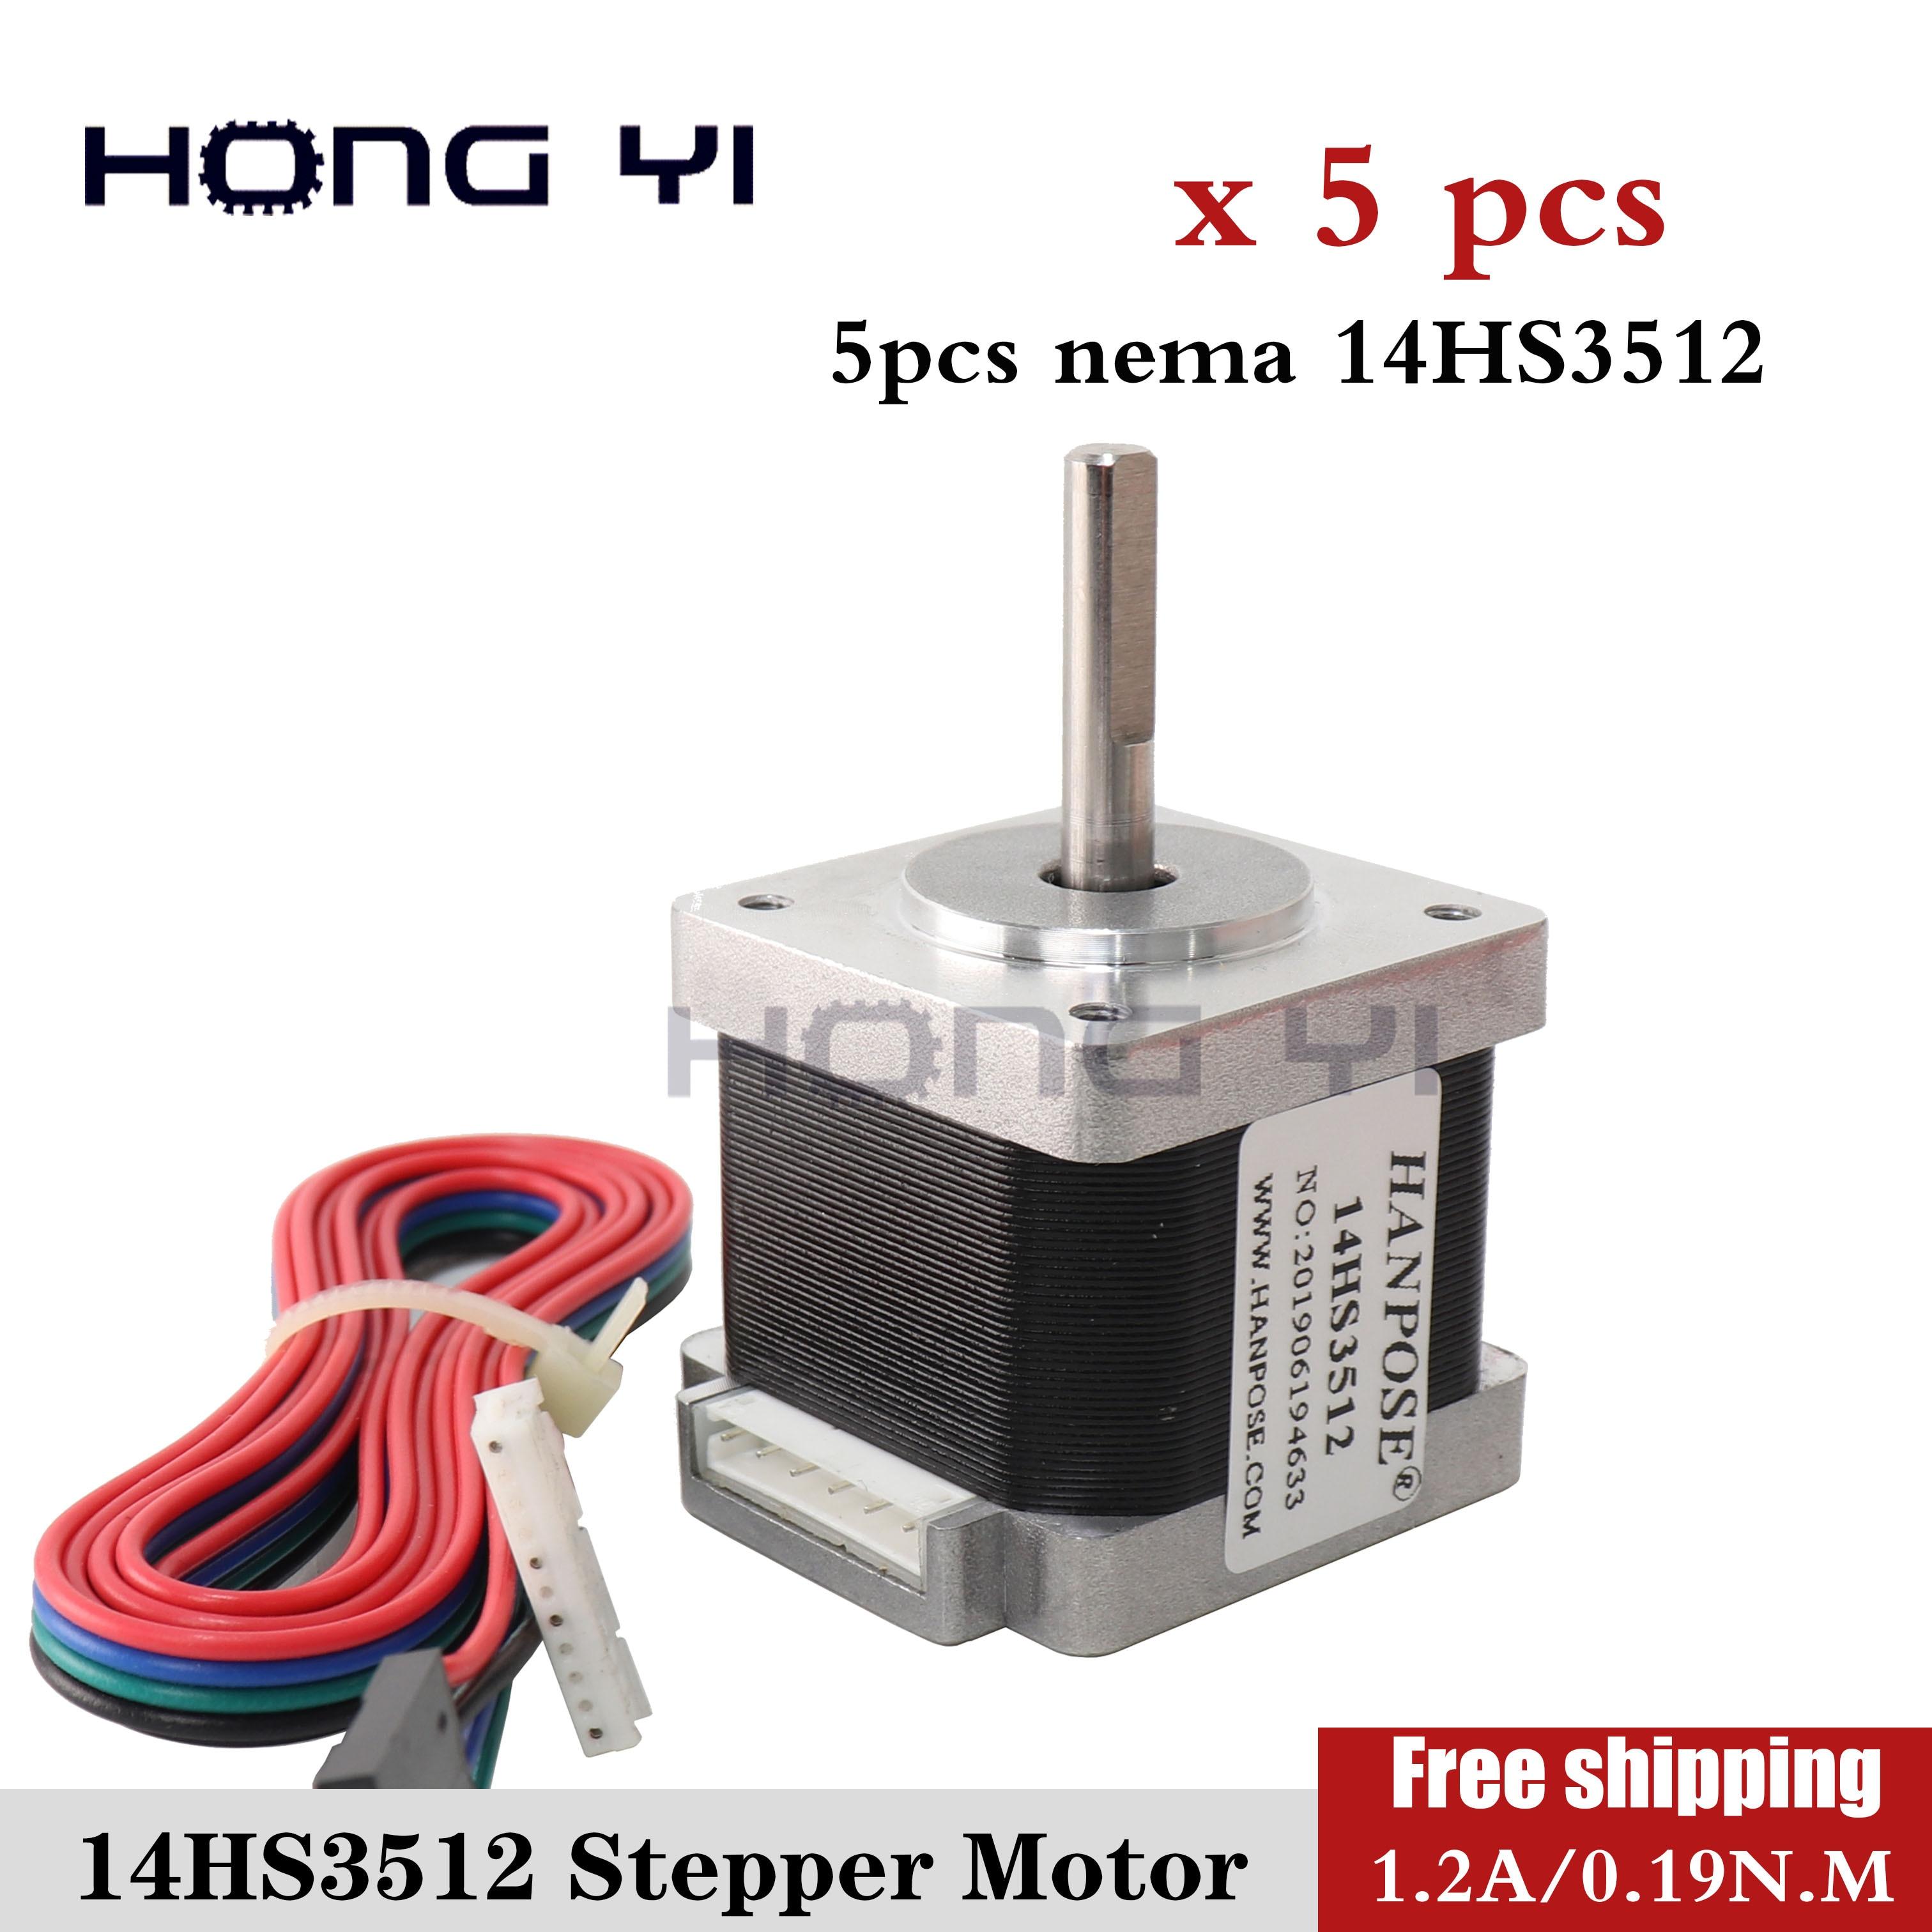 Free shipping 5PCS Nema14 Stepper motor 14HS3512 for Titan extruder 4 lead Nema 14 35mm 14 Motor For 3D Printer Parts